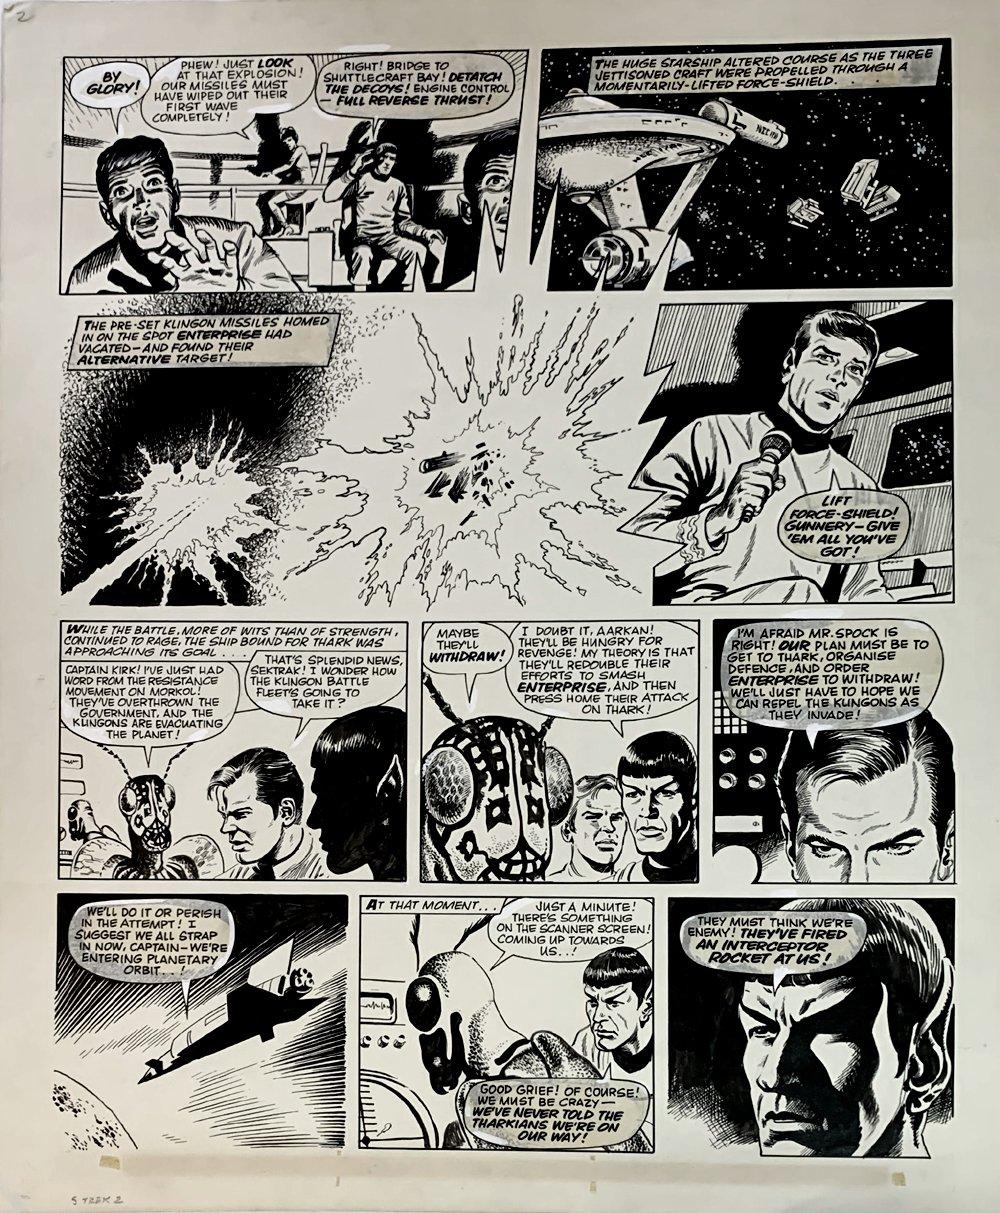 Star Trek Newspaper Strip 6-2-1973 (VERY LARGE)